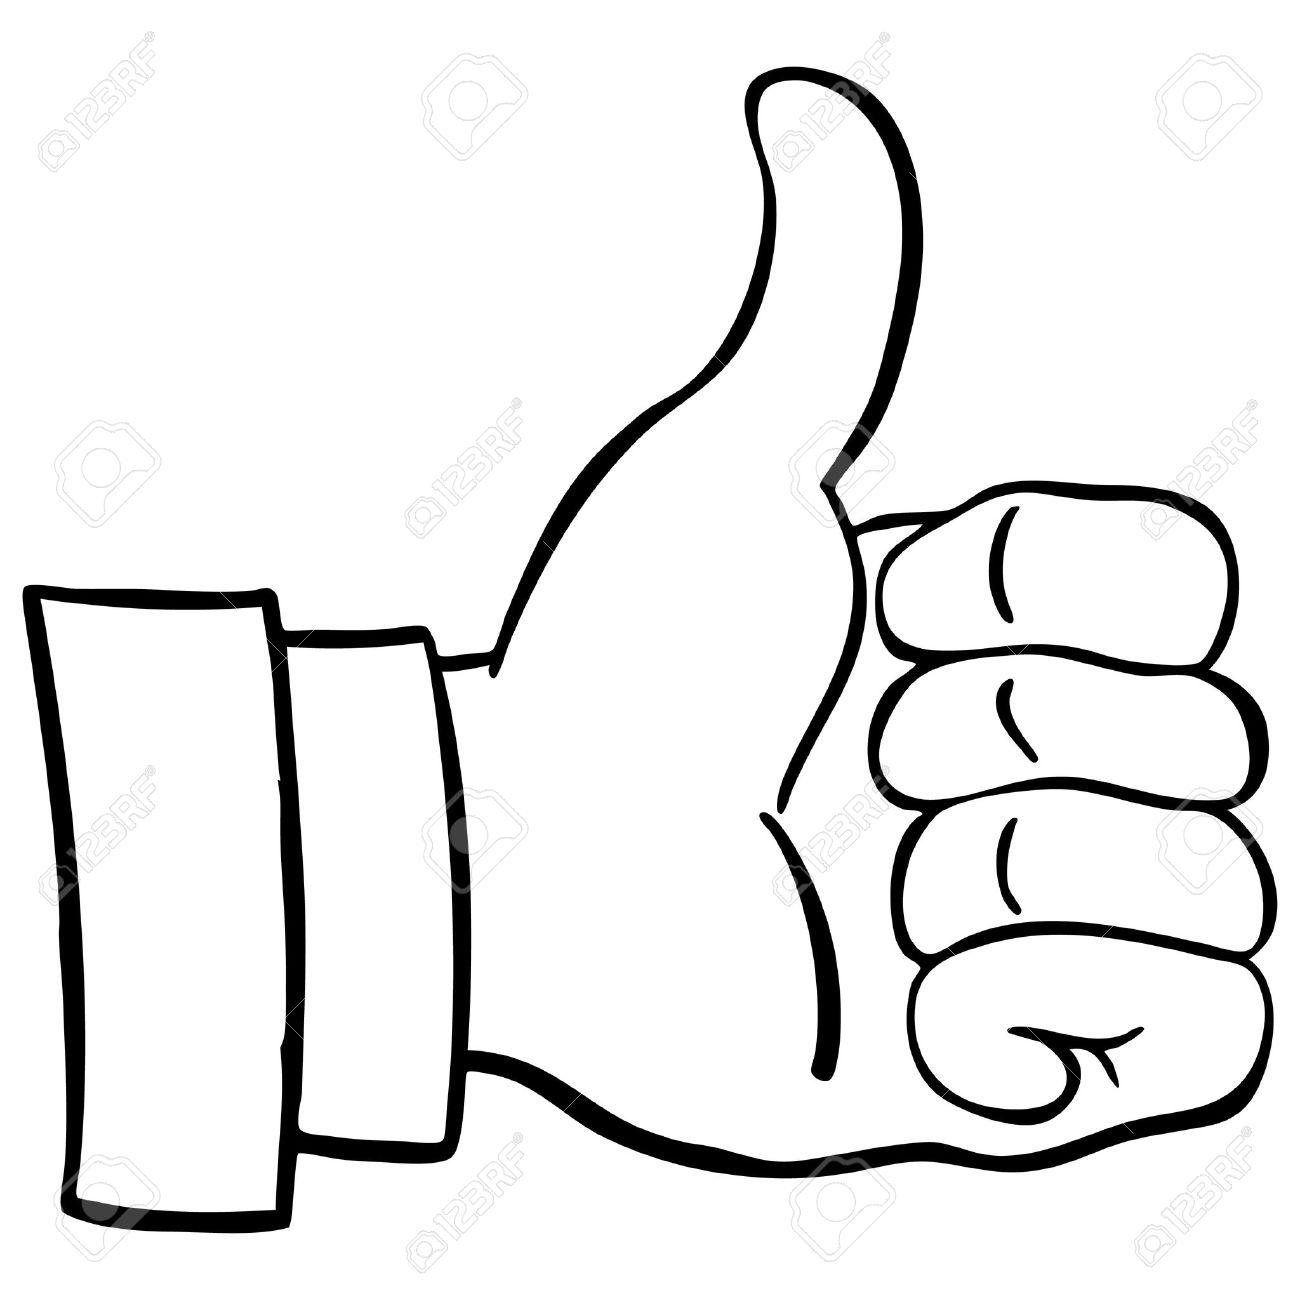 1300x1300 Clip Art Thumbs Up